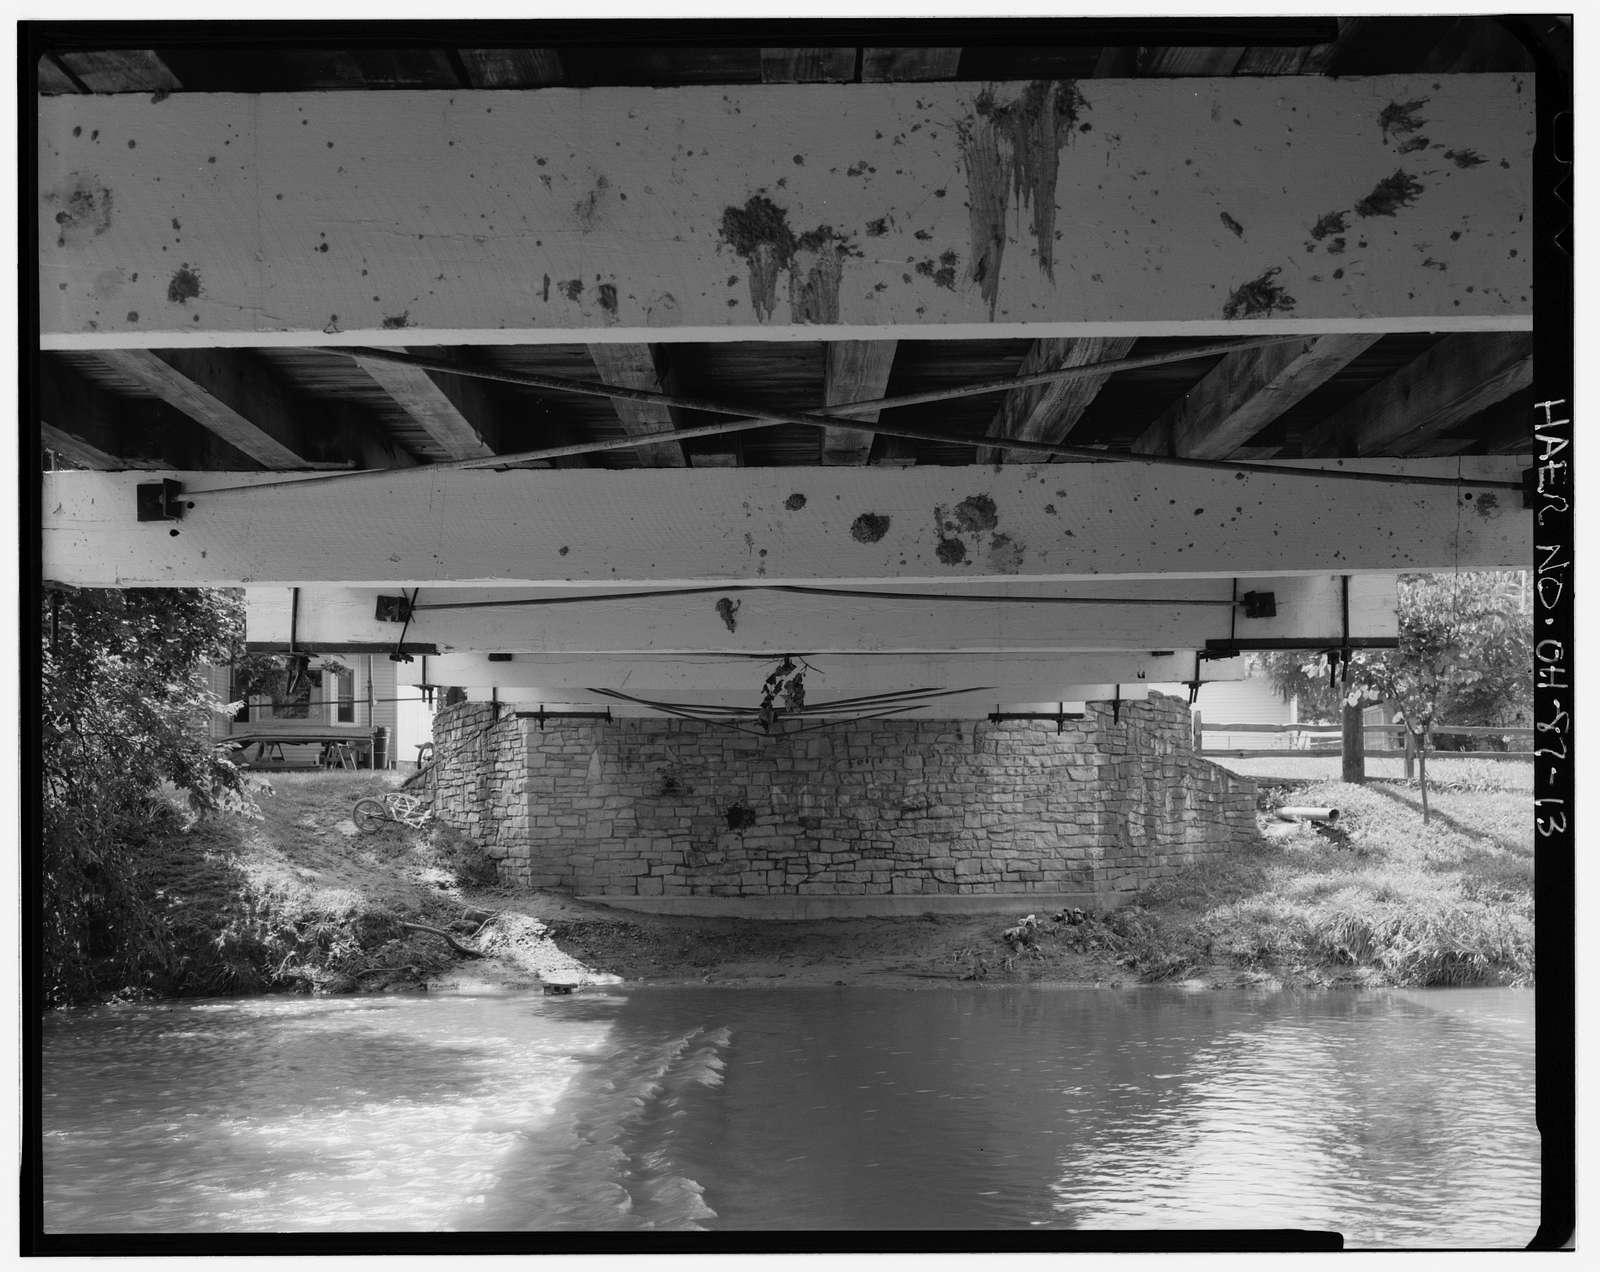 Germantown Covered Bridge, Center Street spanning Little Twin Creek, Germantown, Montgomery County, OH